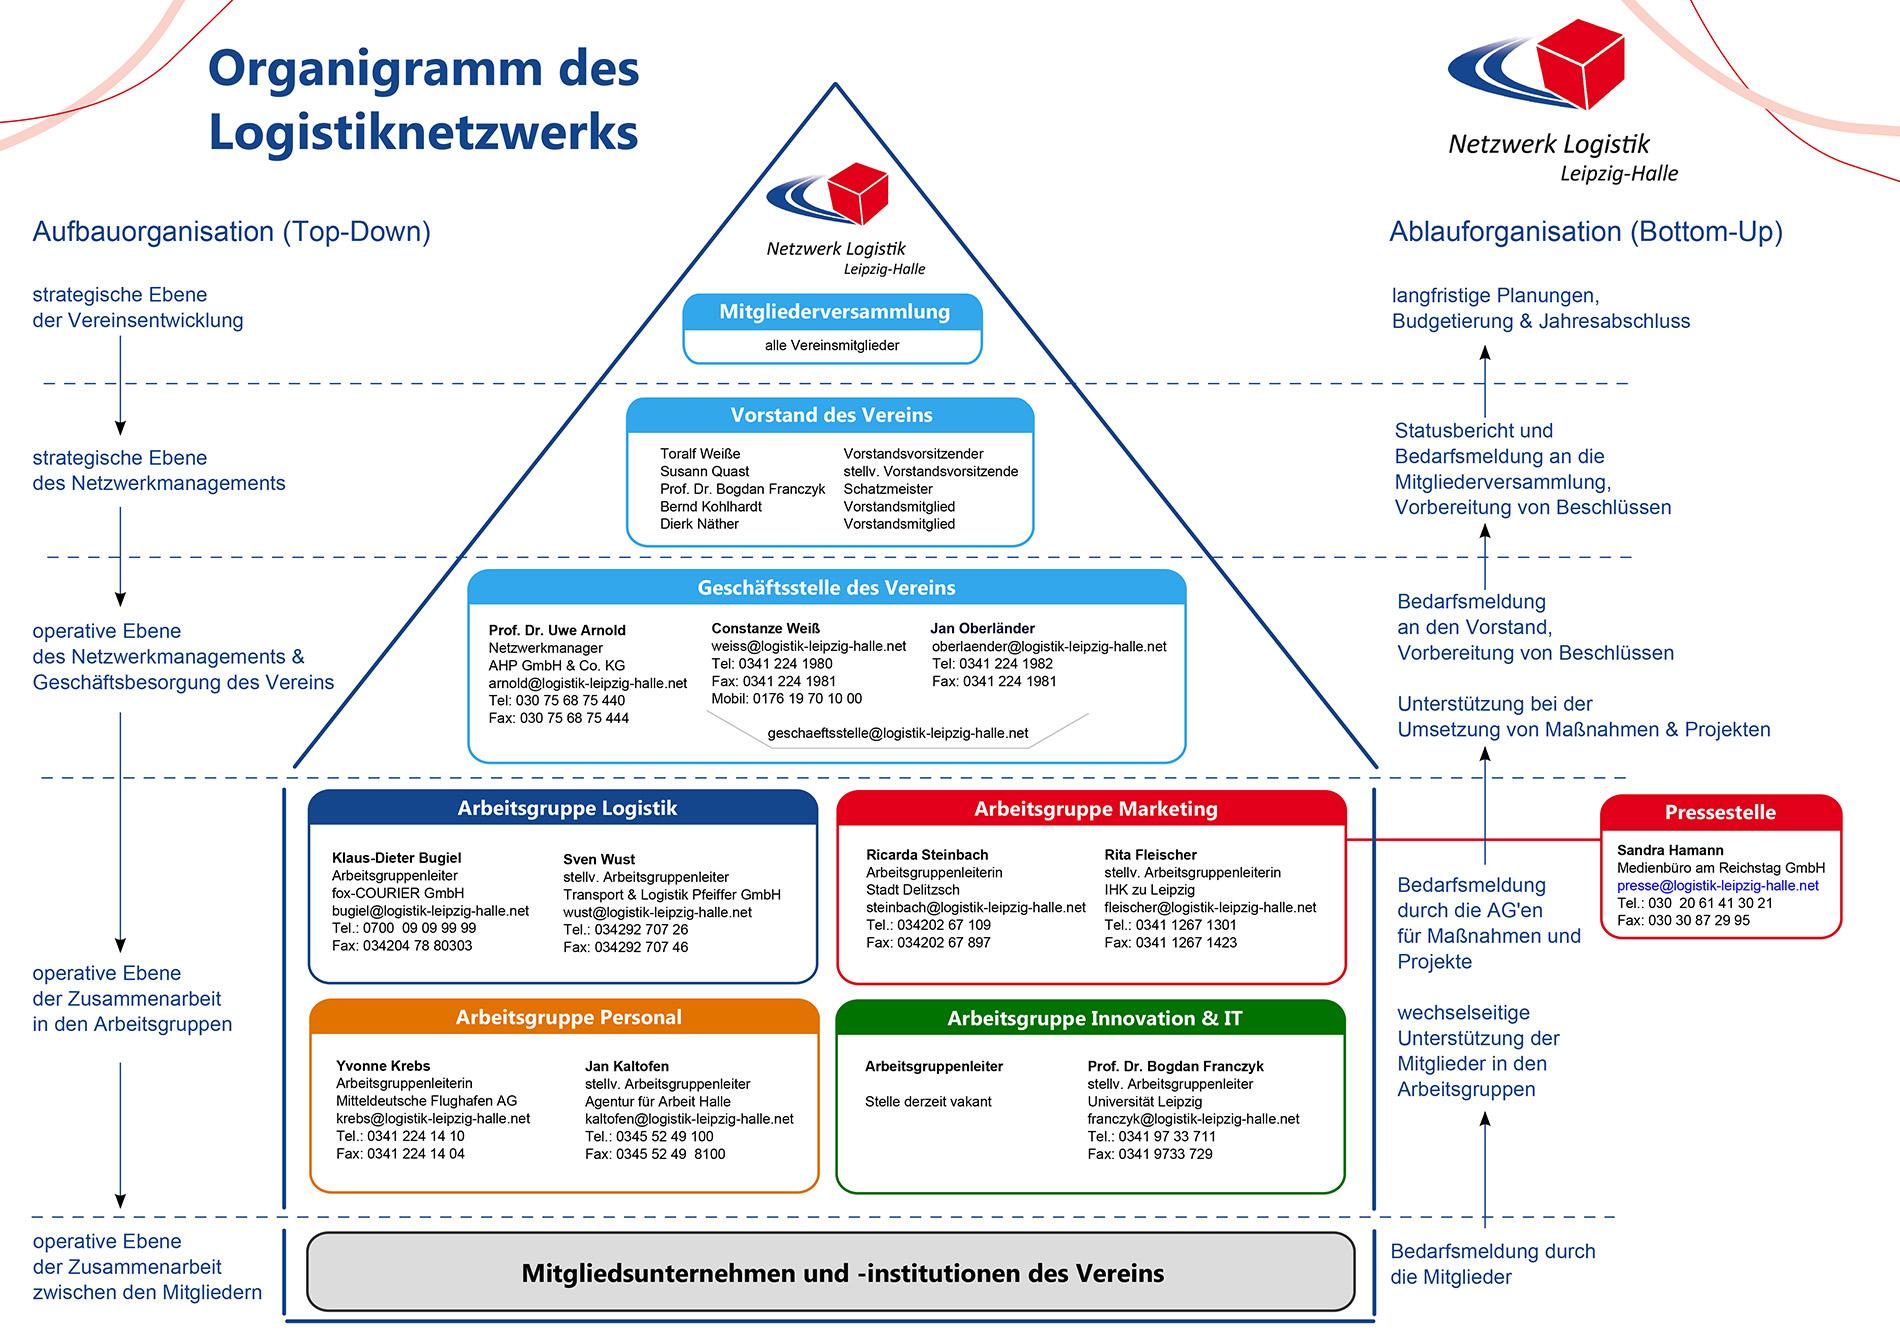 Organigramm Netzwerk Logistik Leipzig-Halle e. V.